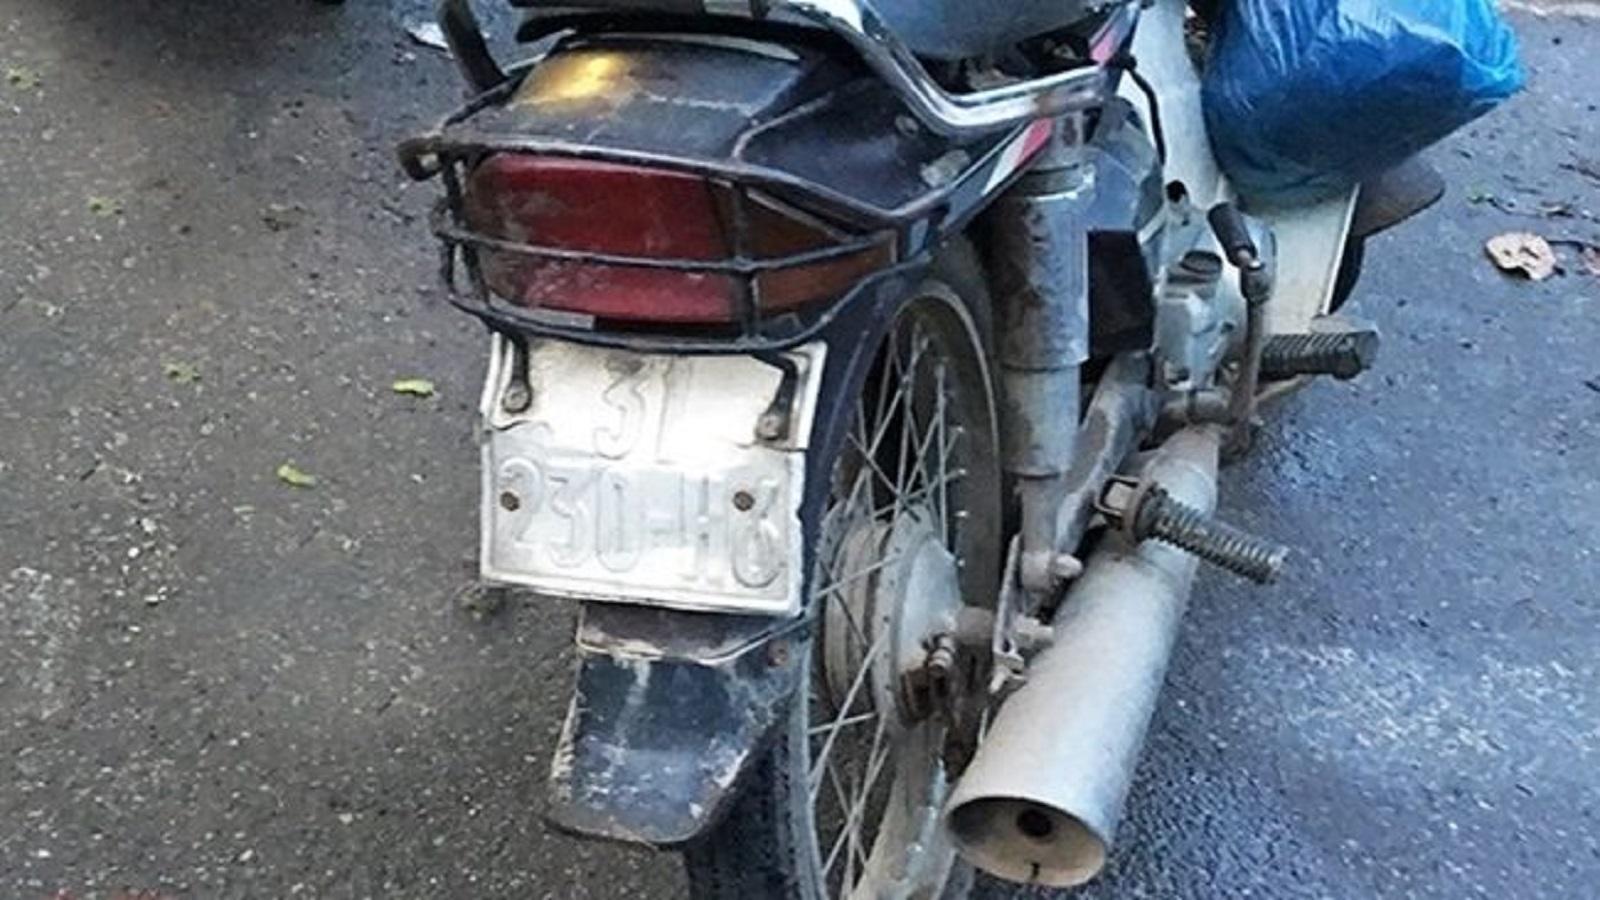 khong phai ai cung biet xe mo bien so bi phat tien len den 1 trieu dong